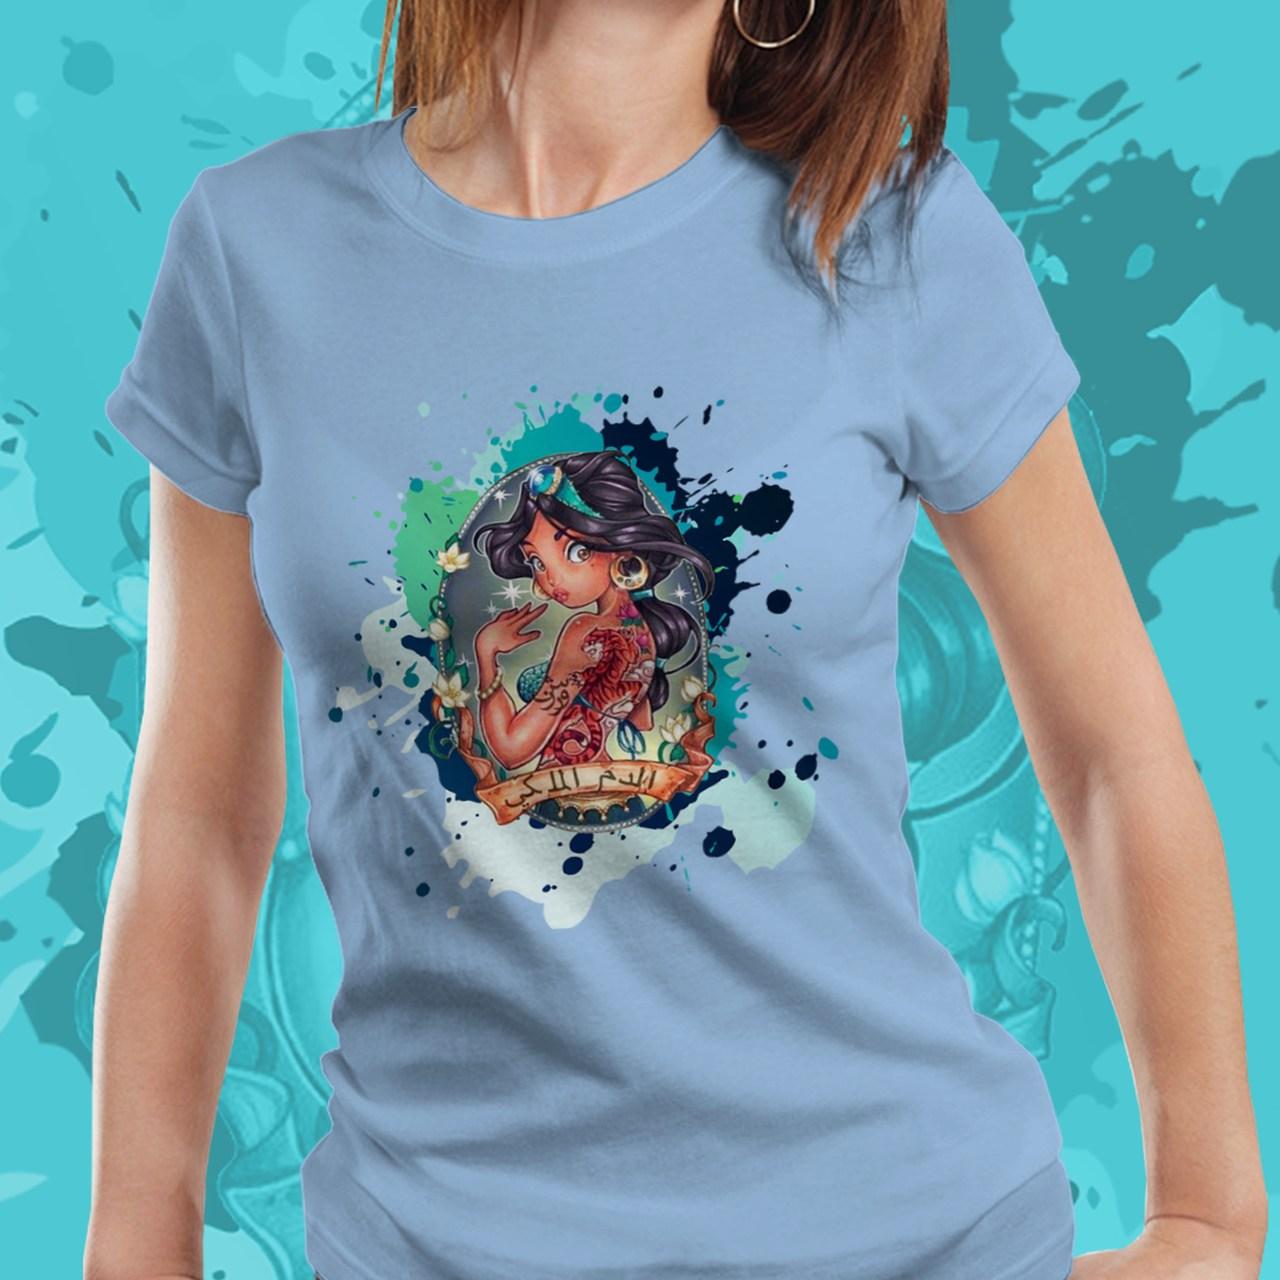 Camiseta Feminina Princesa Jasmin: Alladin - Disney (Azul) - EV